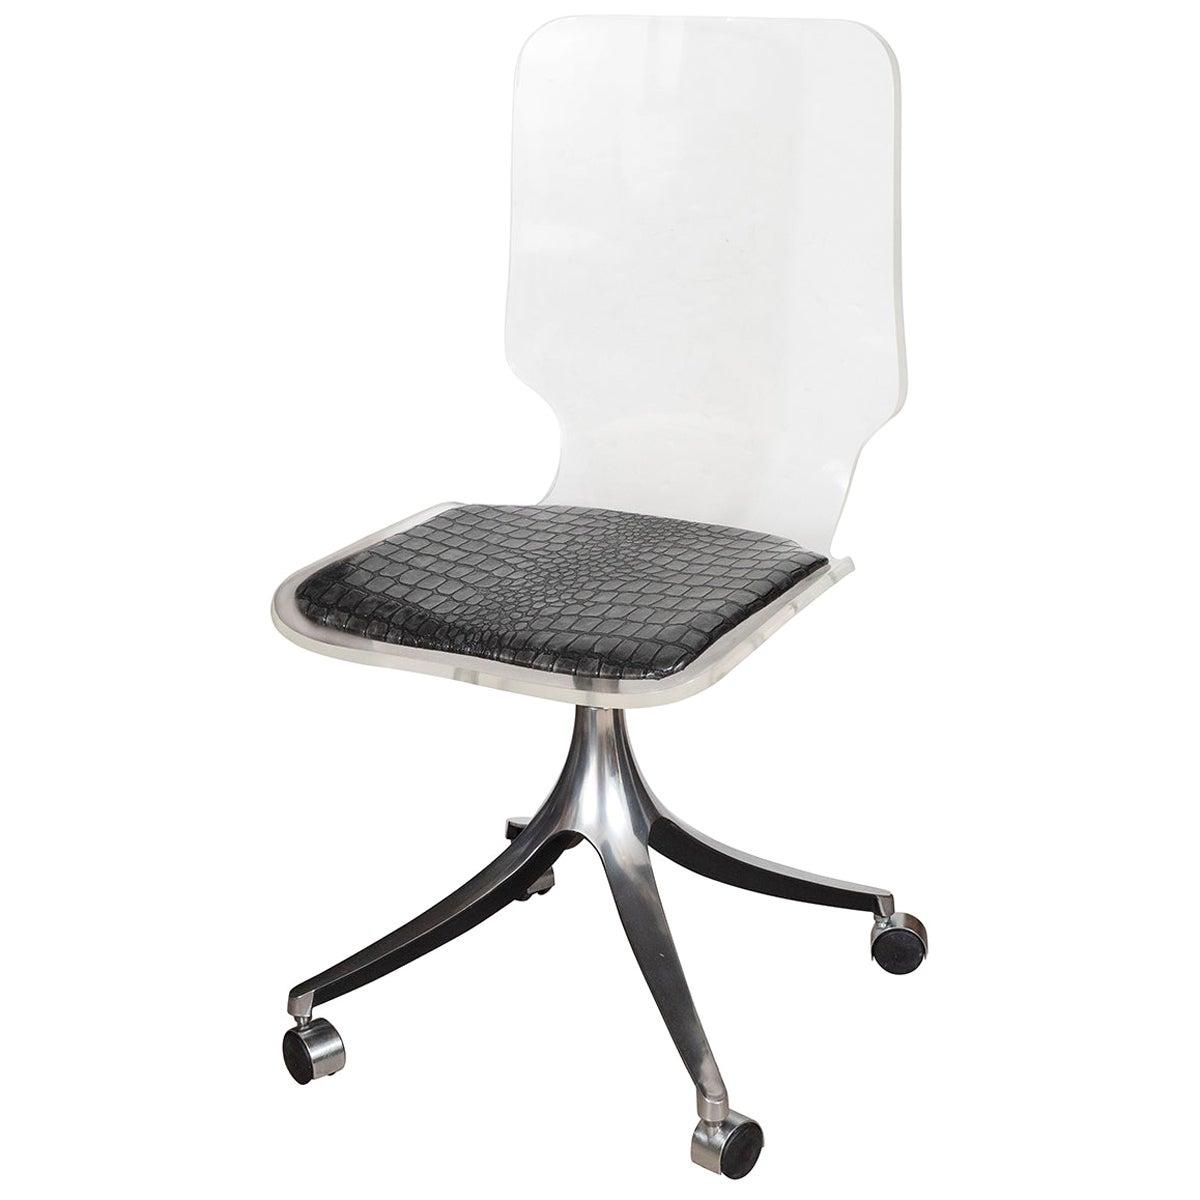 Acrylic Rolling Chair